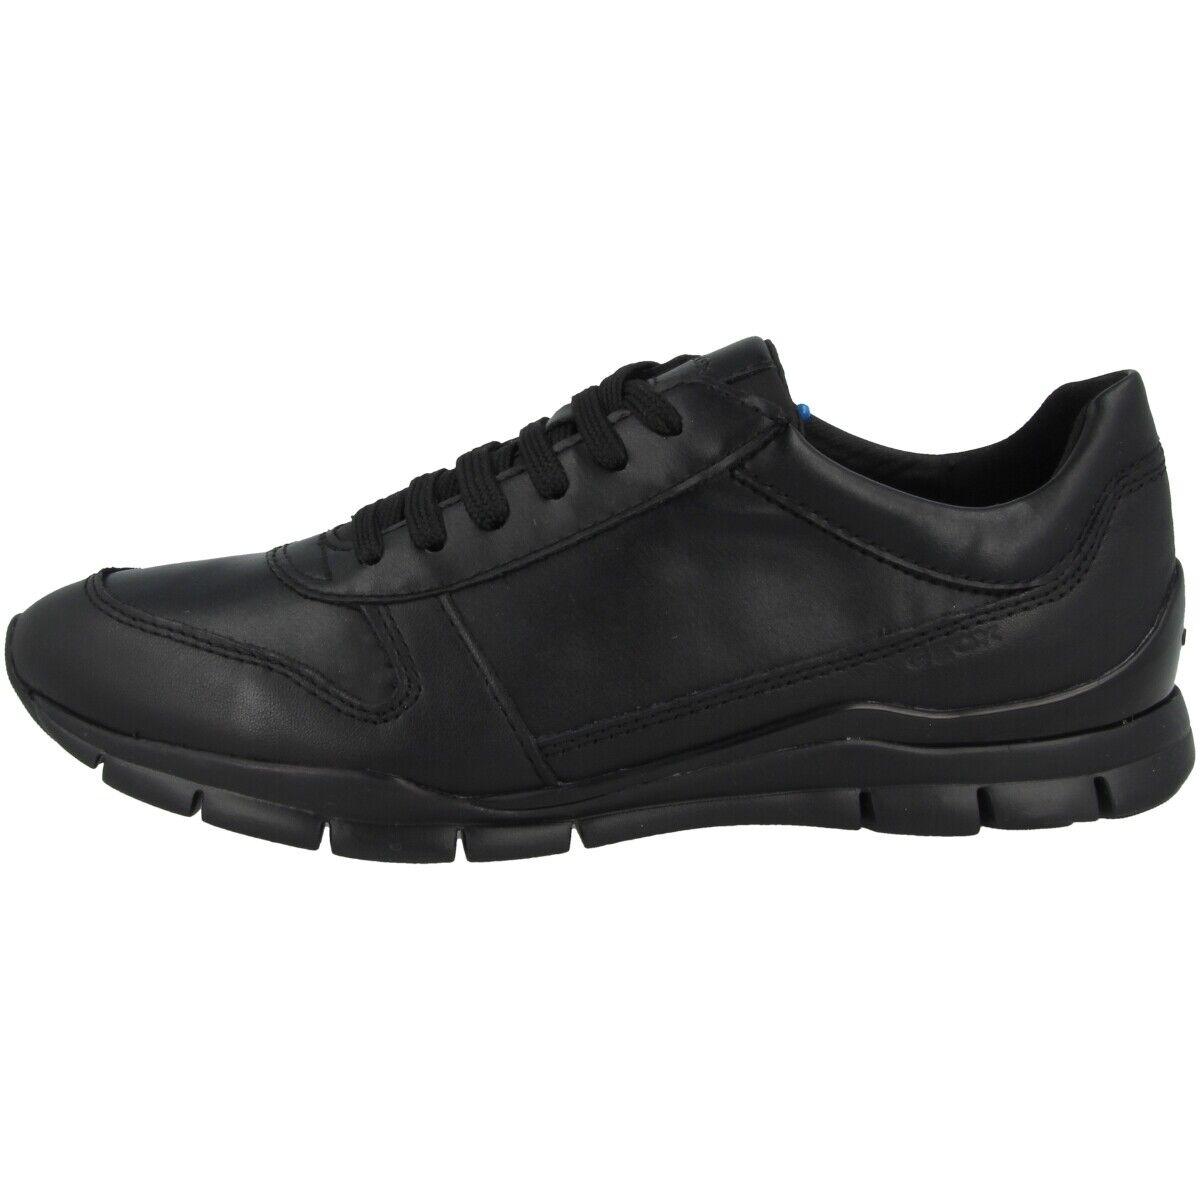 Geox D Sukie C scarpe Wouomo scarpe  da ginnastica Casual Trainers nero D94F2C05485C99999  sconto